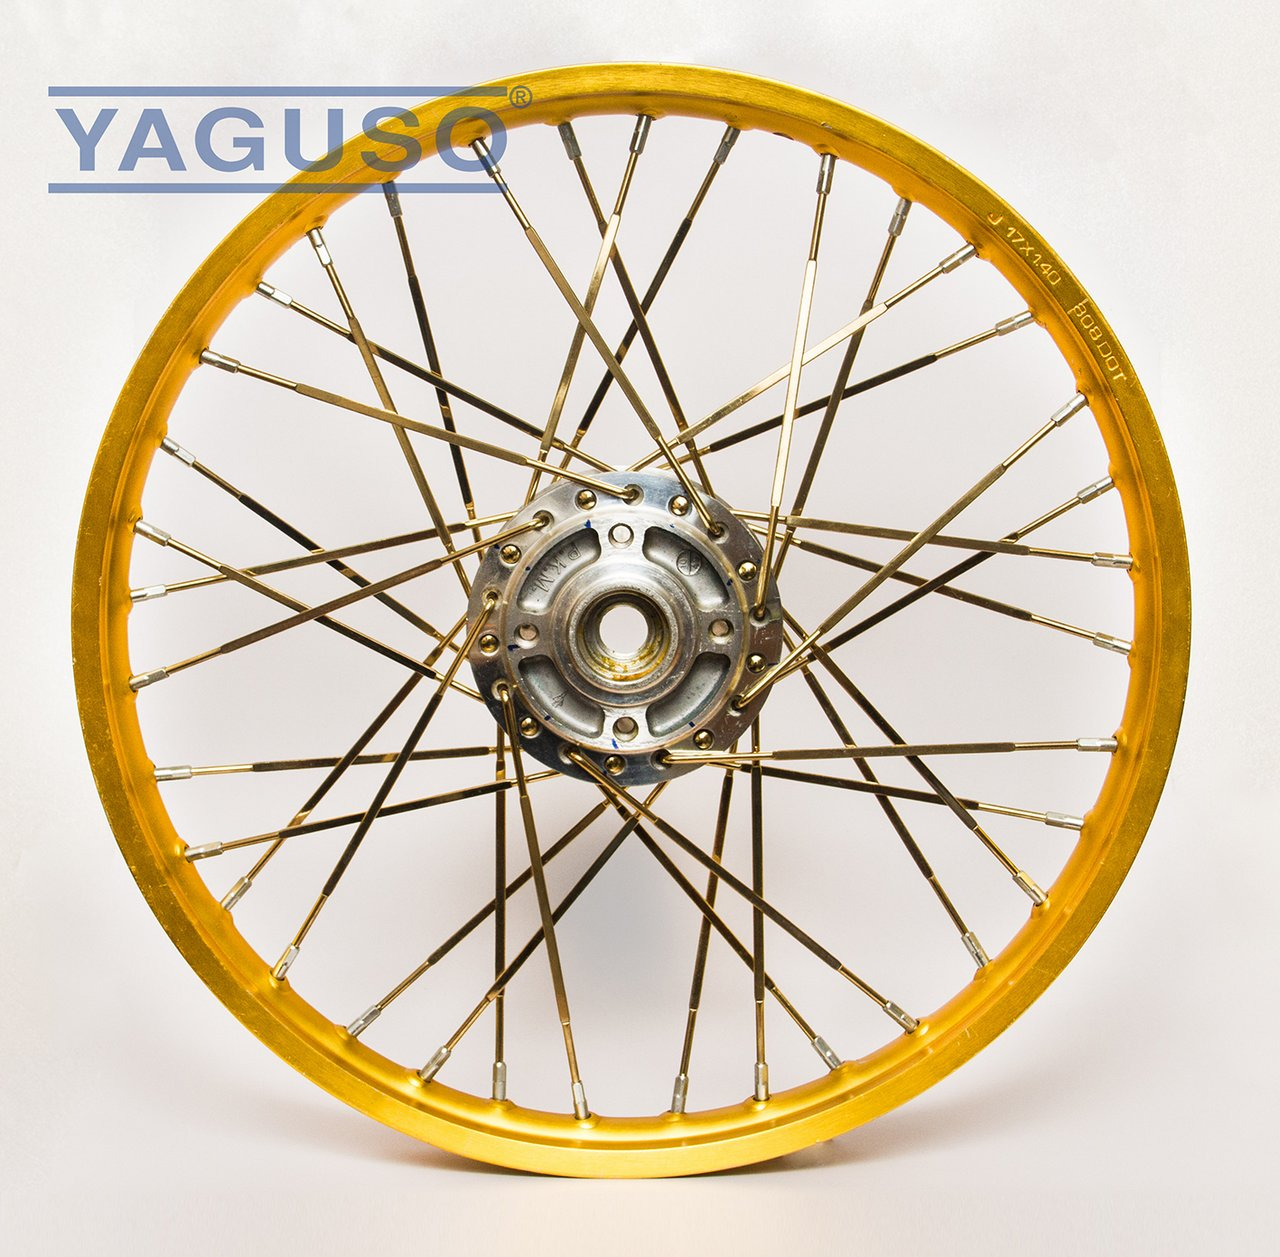 40 gold plated steel long nipples Harley spoke wire wheel